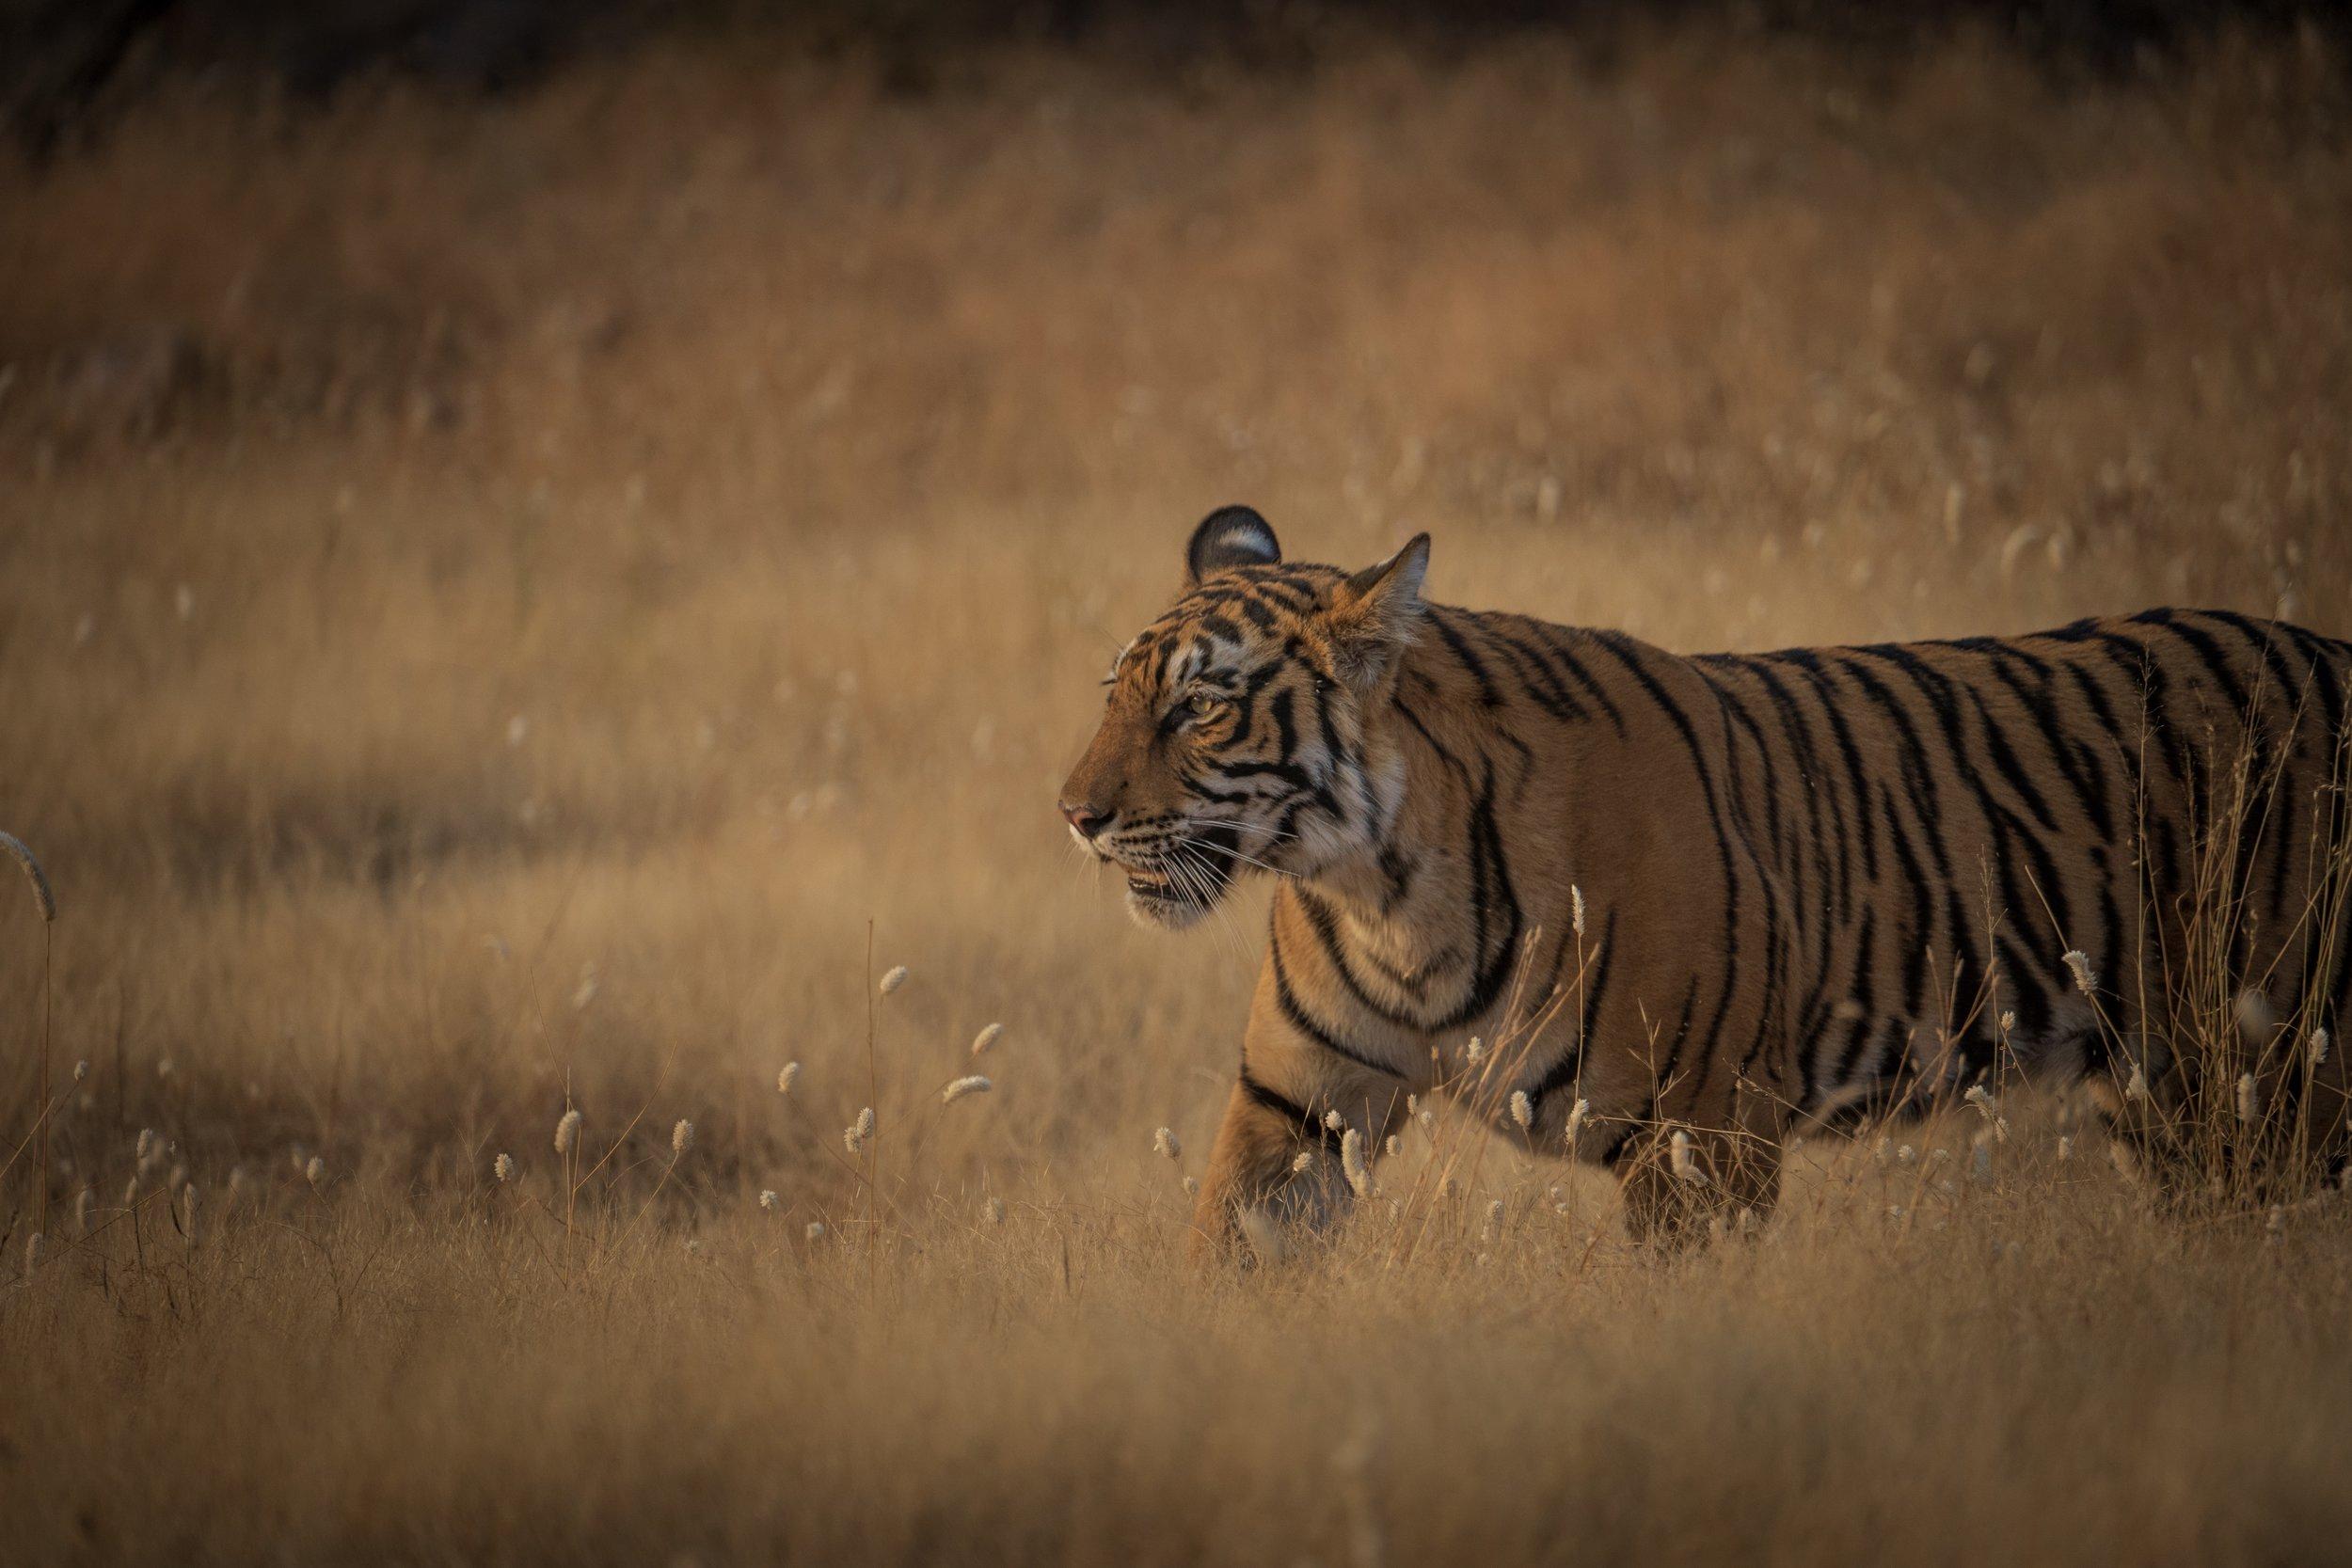 RanthamboreNational Park - An epic safari to capture India's majestic Royal Bengal TigersDecember 2018